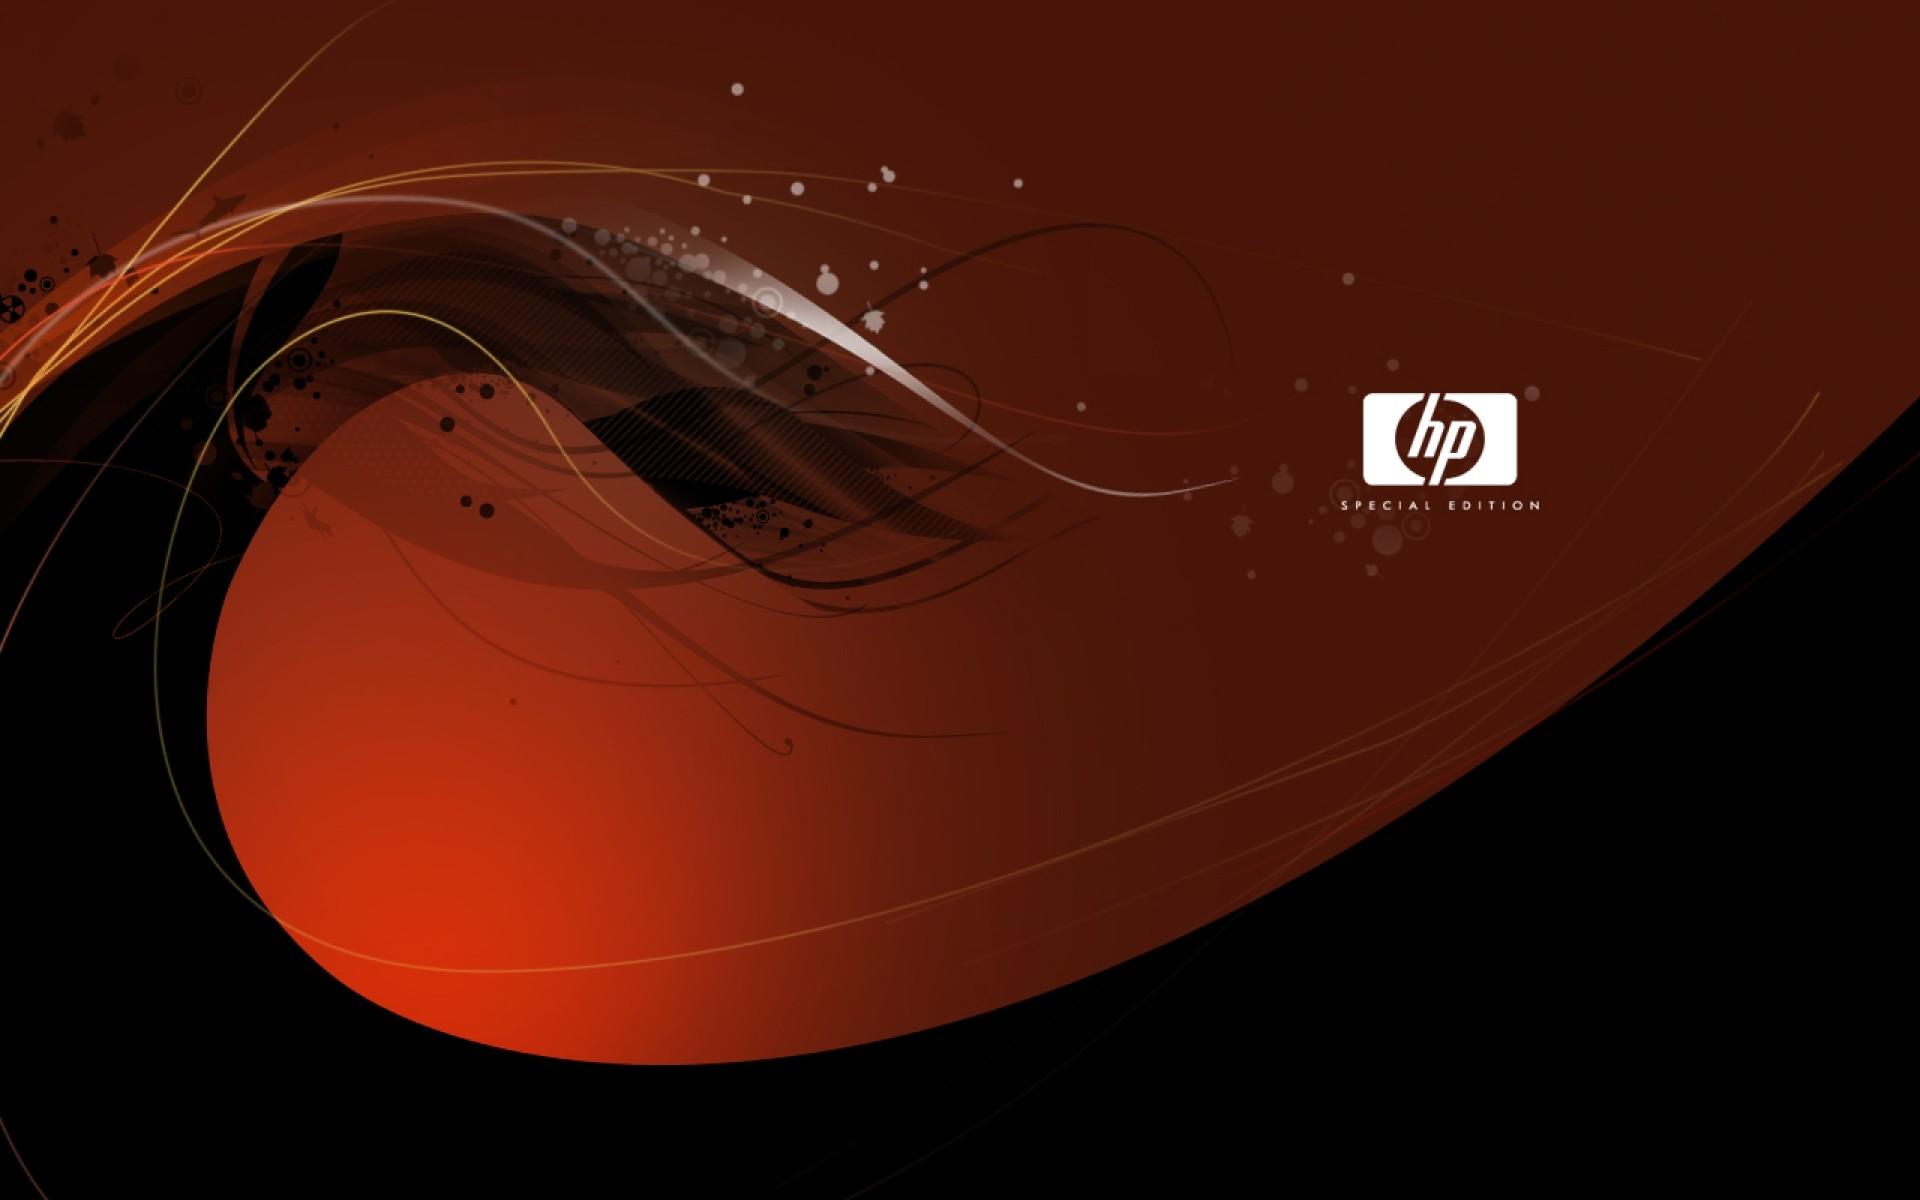 Hd hp wallpapers wallpapertag - Hp screensaver ...